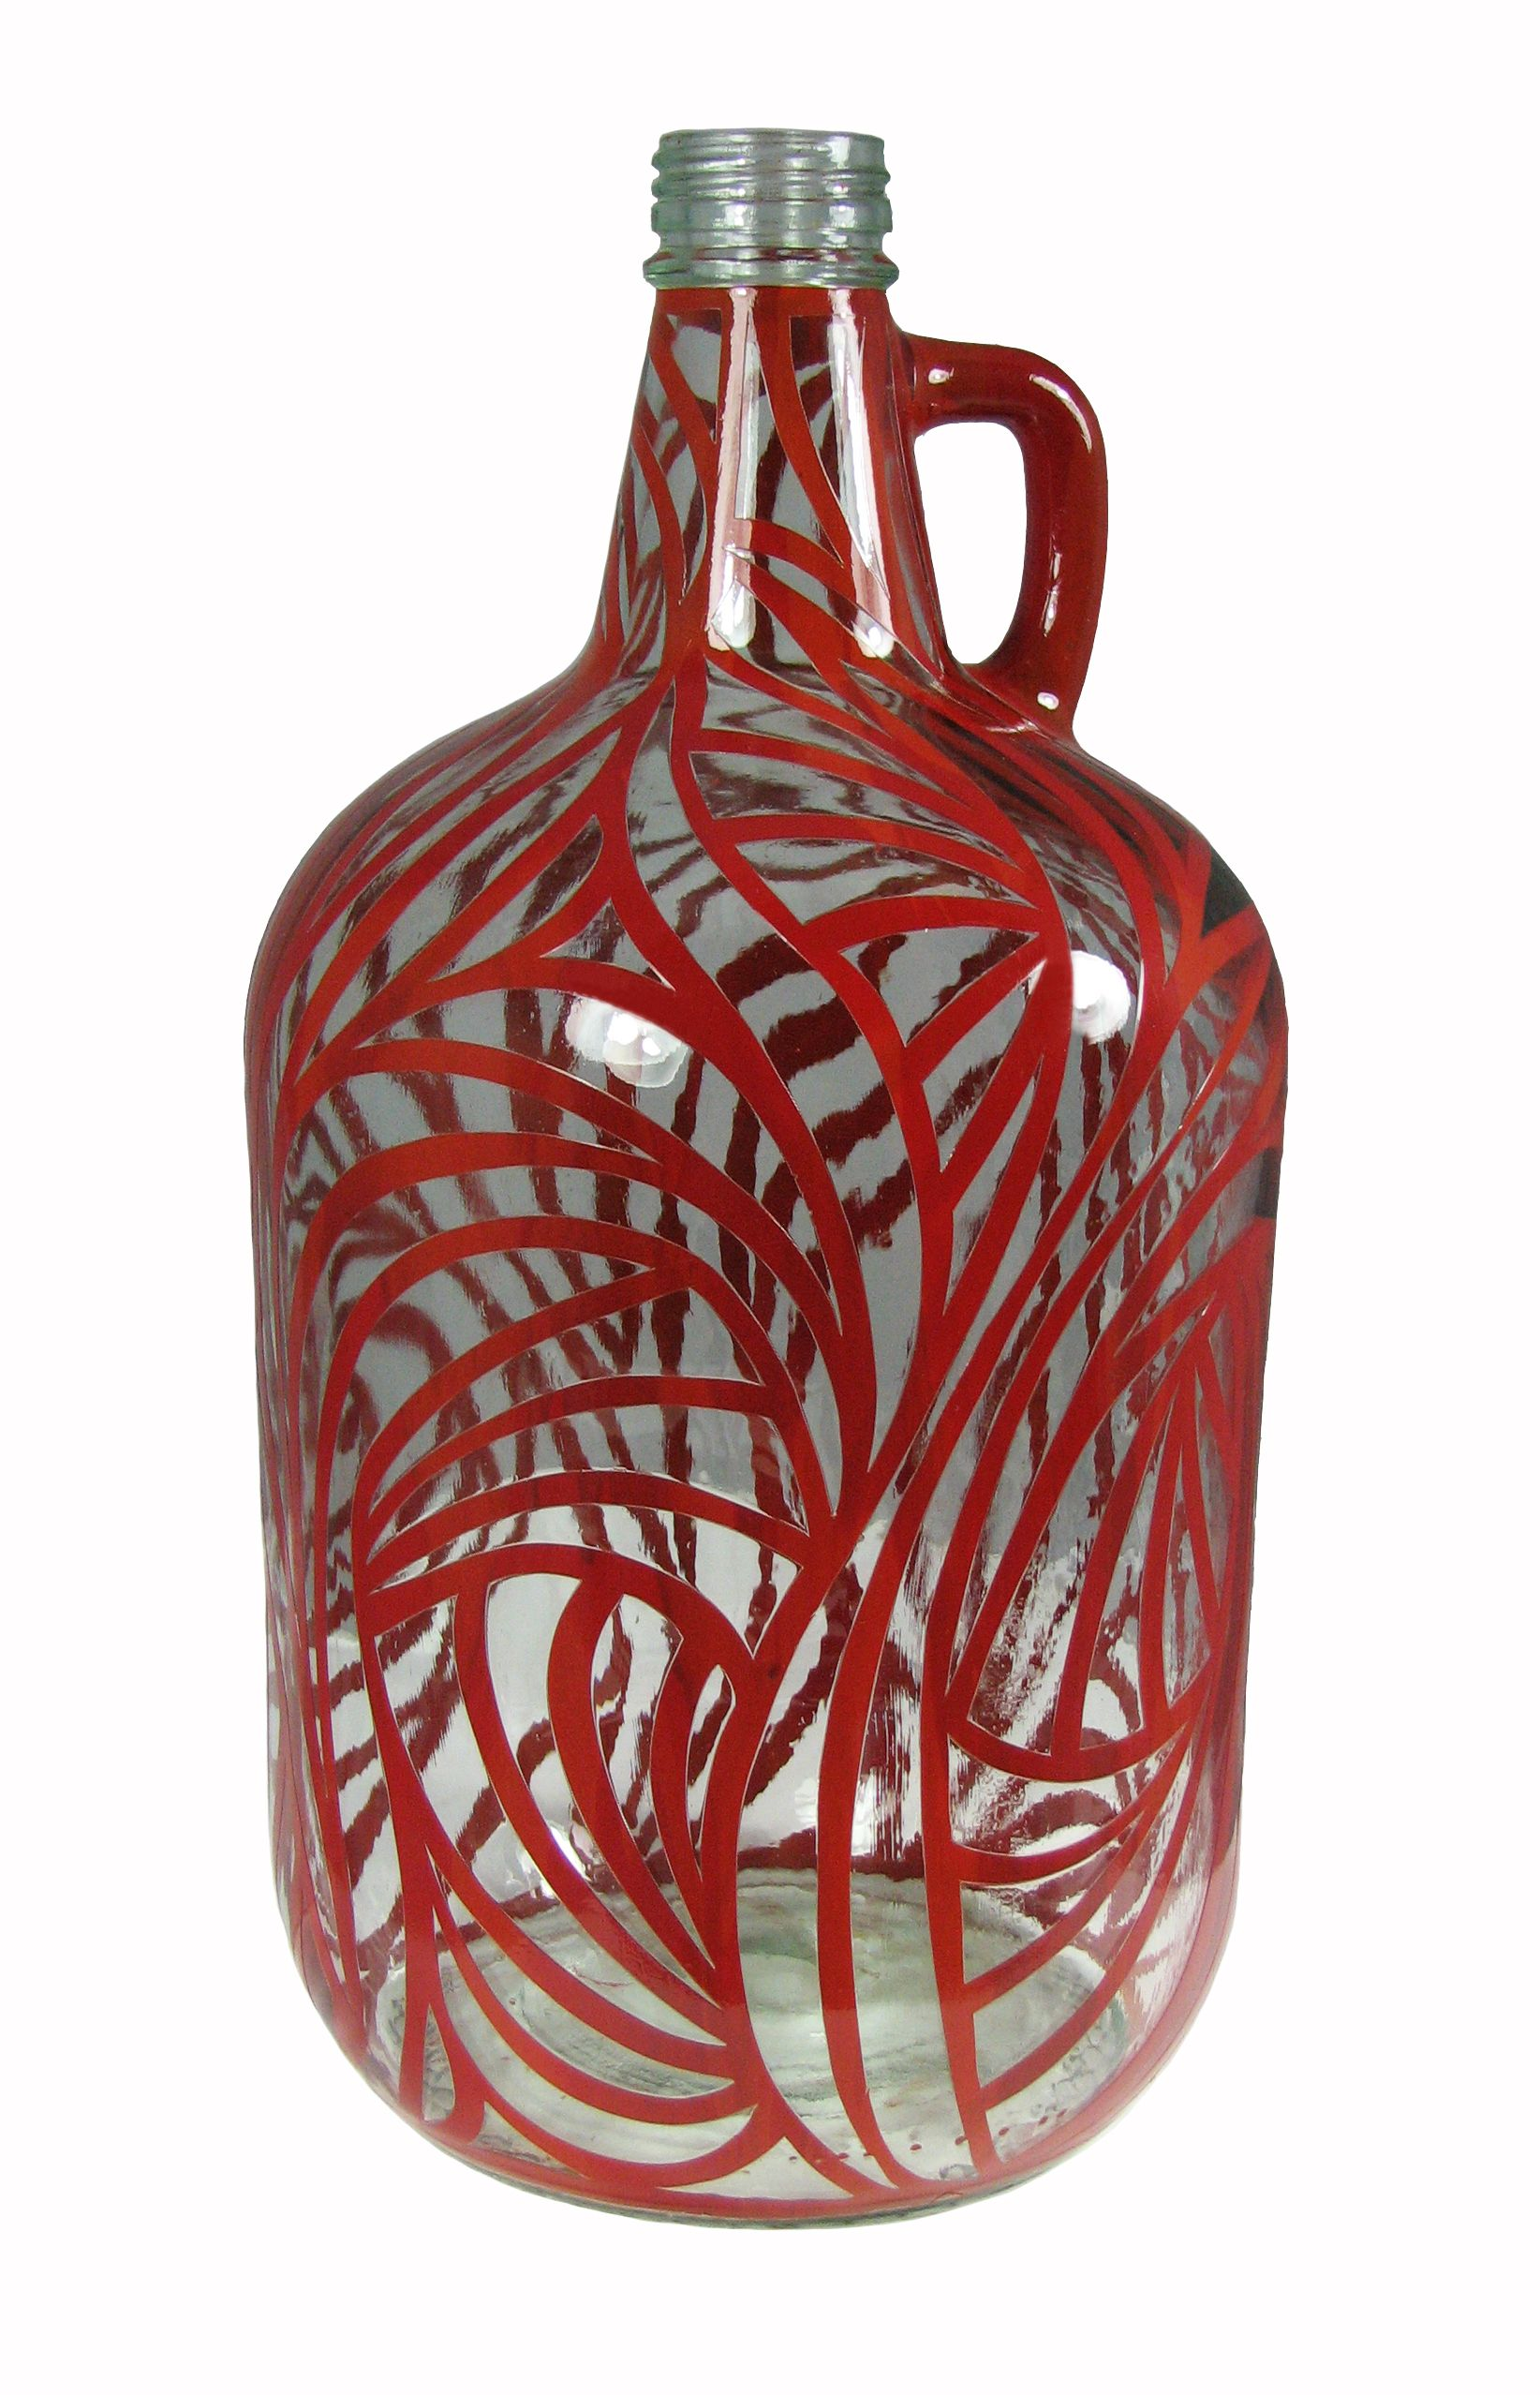 Www Amylynnross Com Carlo Rossi Bottle Re Invented Diy Bottle Bottle Terrarium Recycled Glass